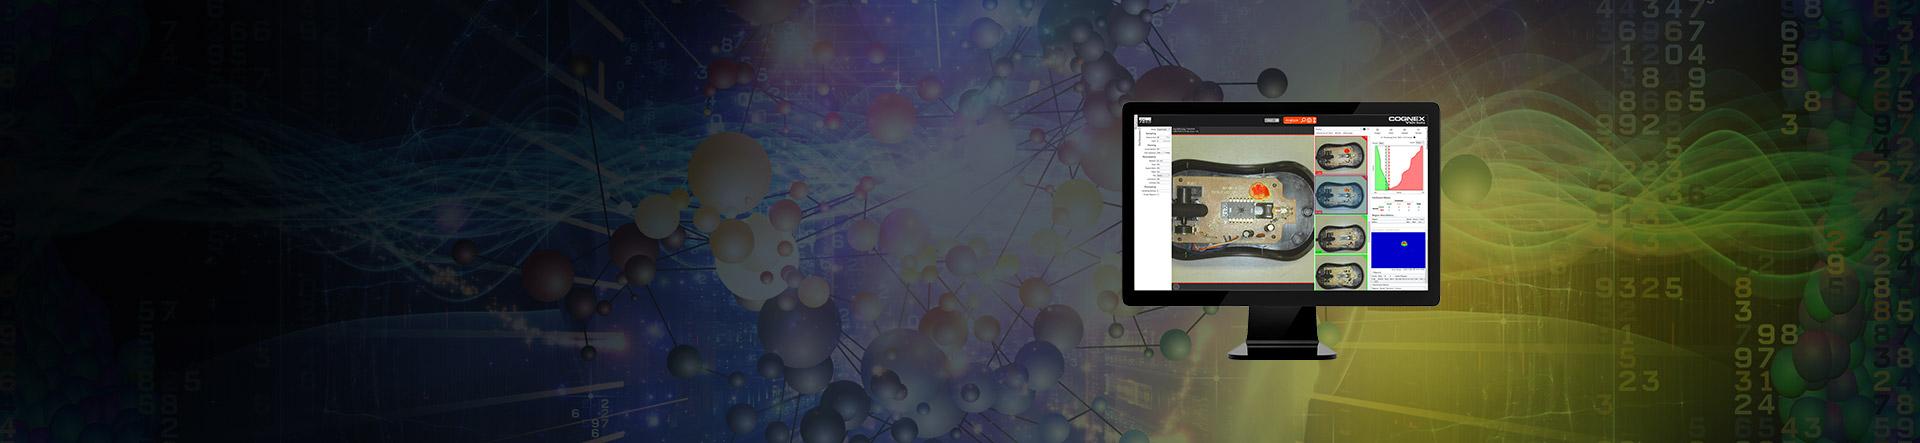 VisionPro ViDi Deep Learning Software